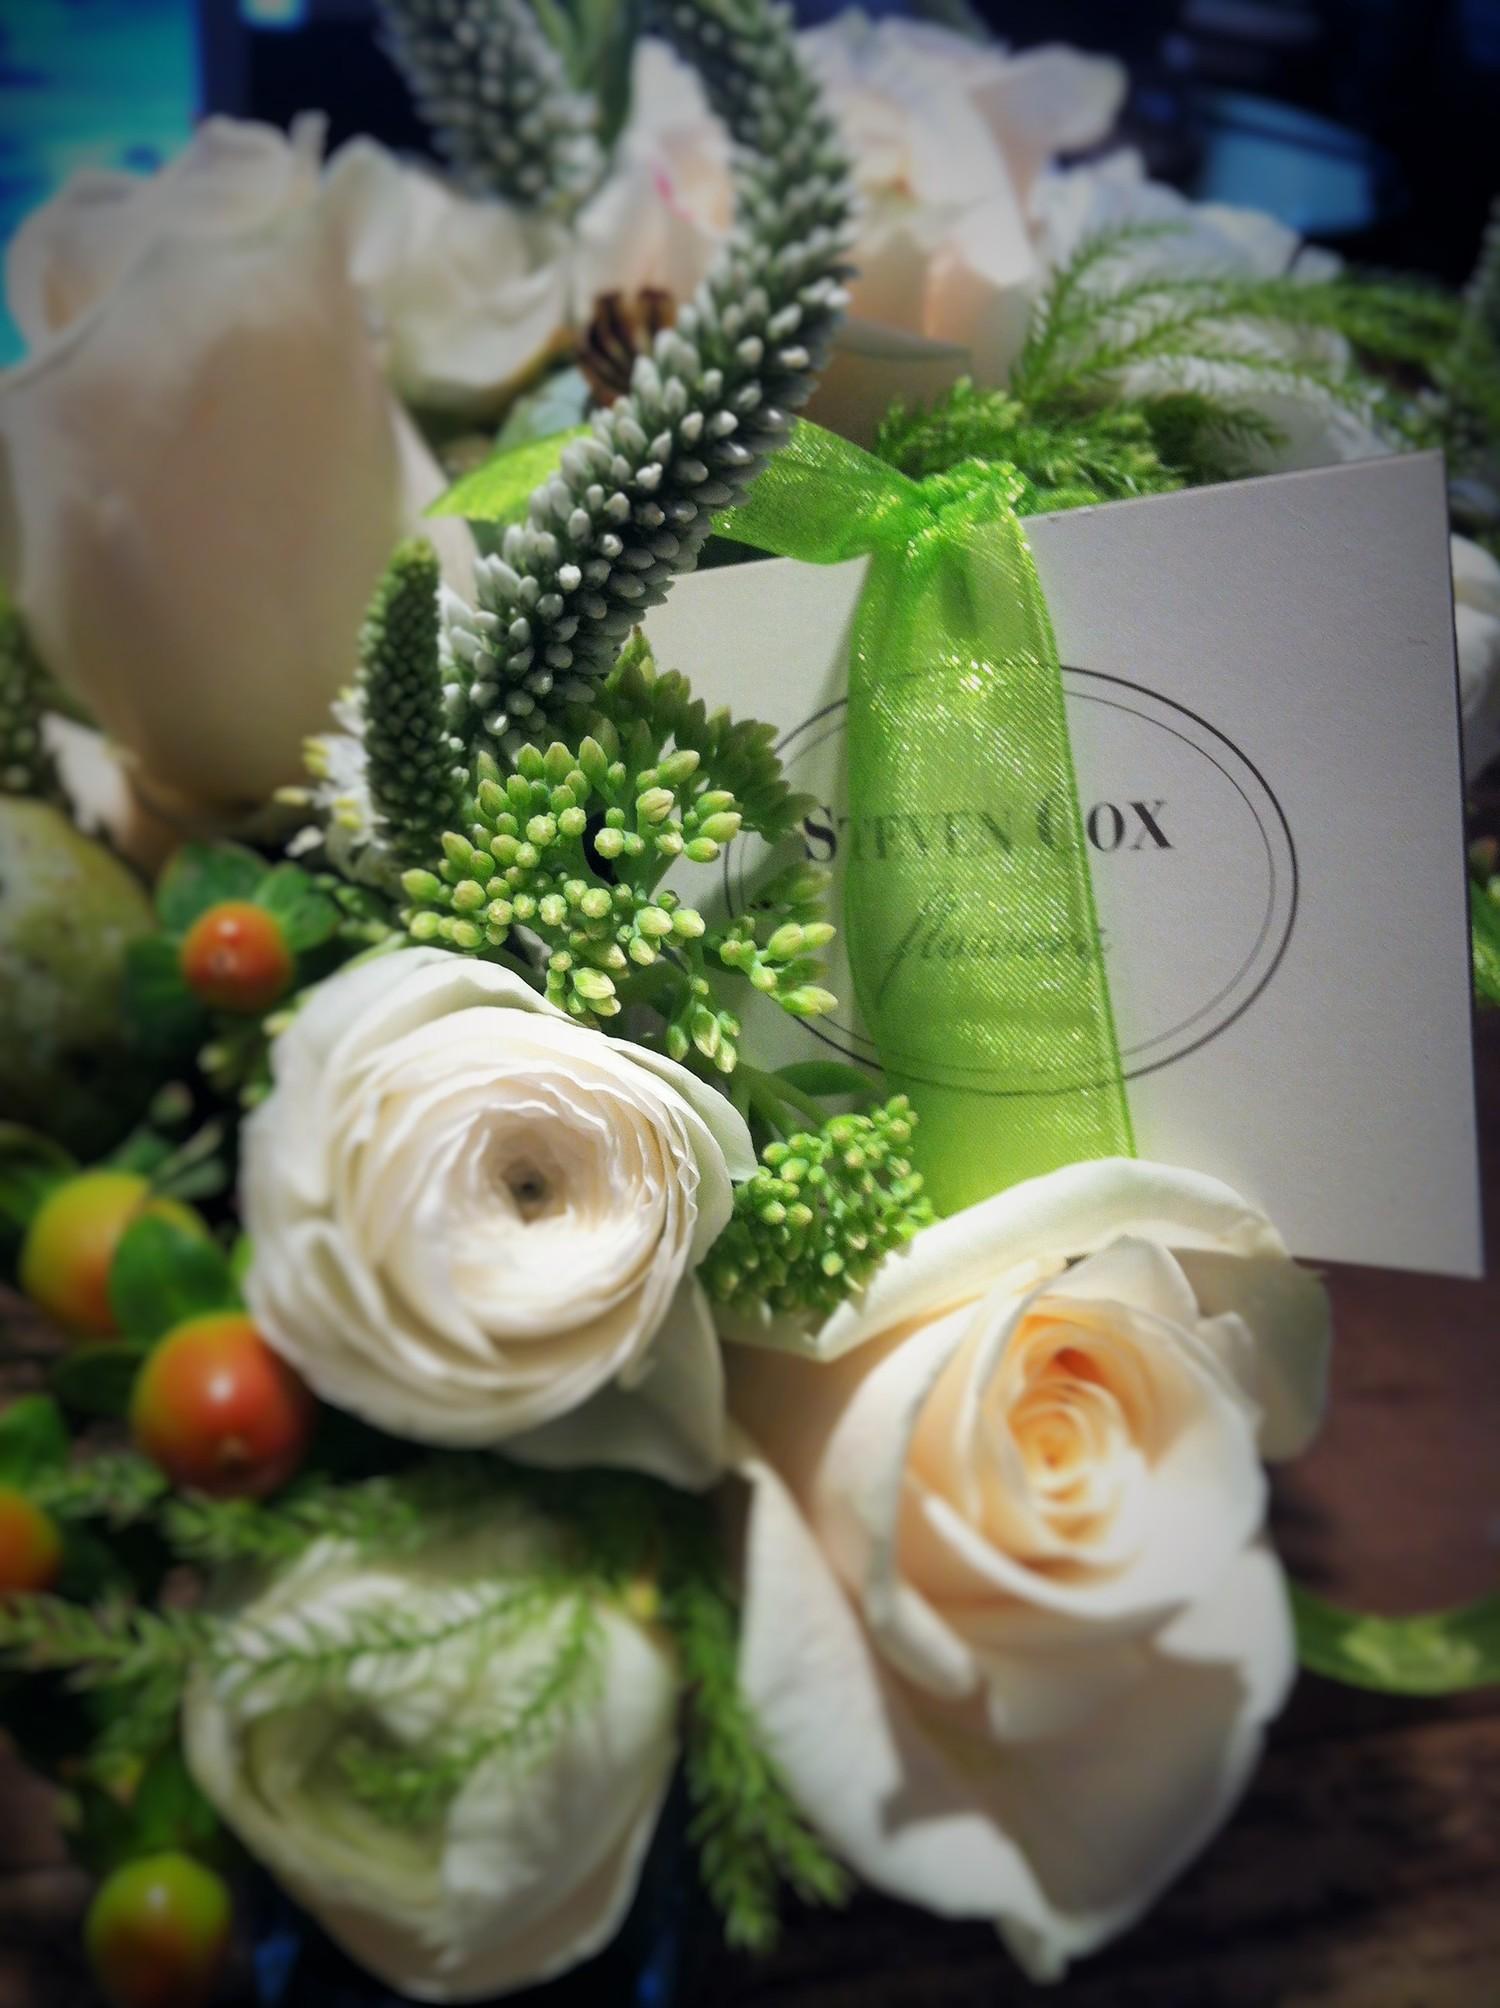 Steven cox flowers 6142246555 flowers izmirmasajfo